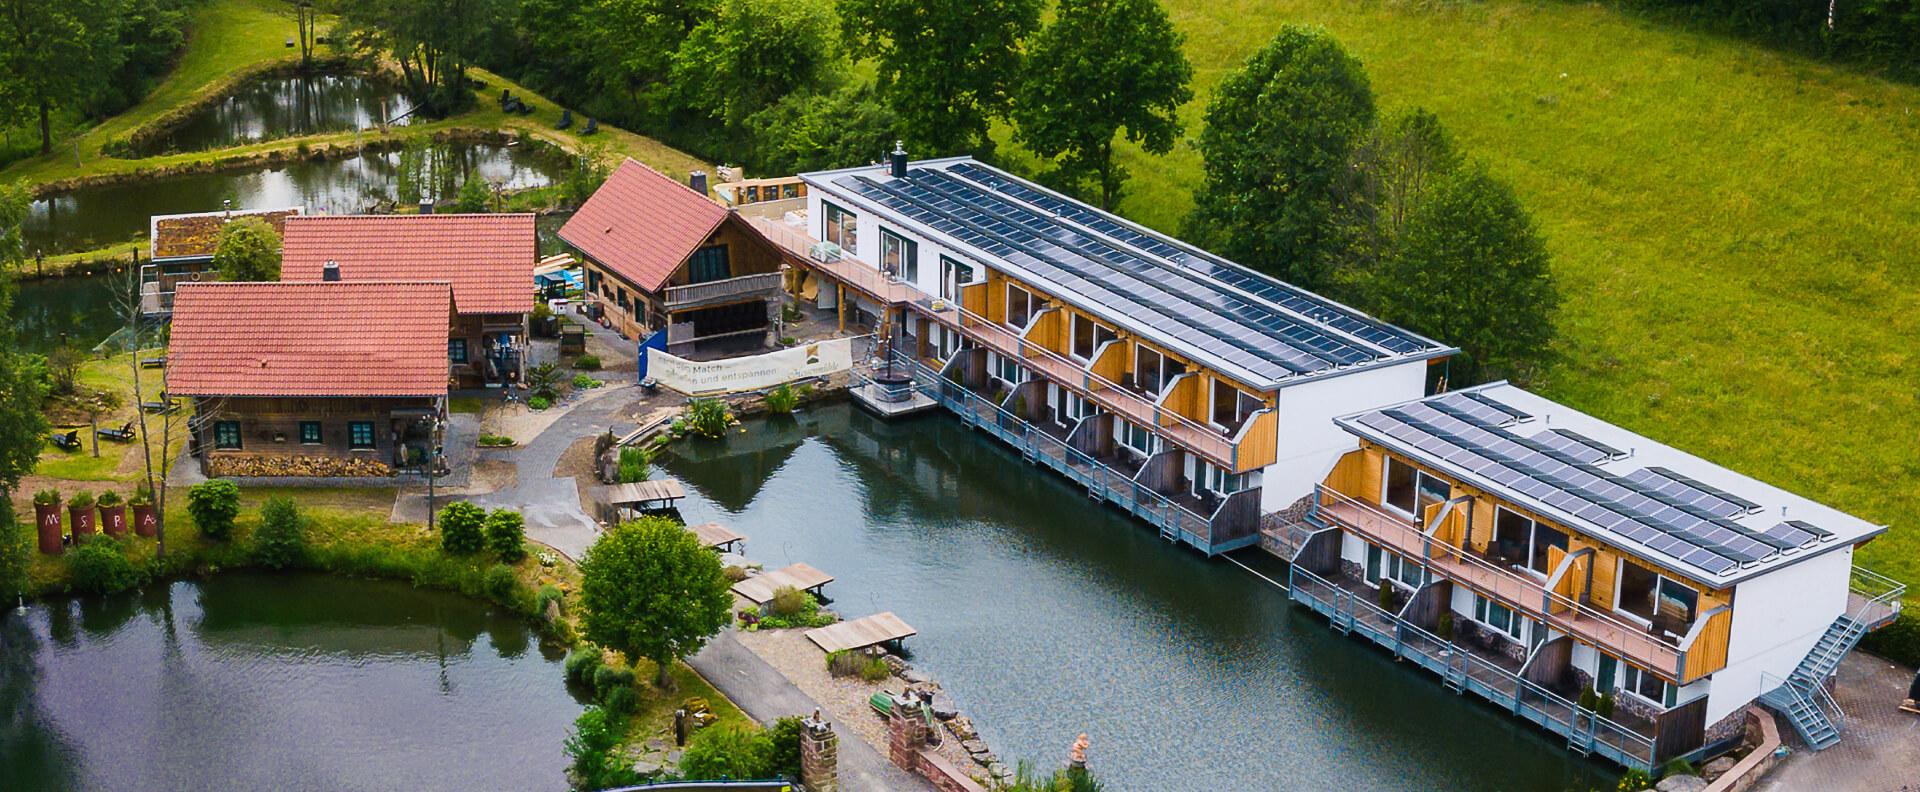 KSE - Referenz Gewerbekunden Hessenmühle